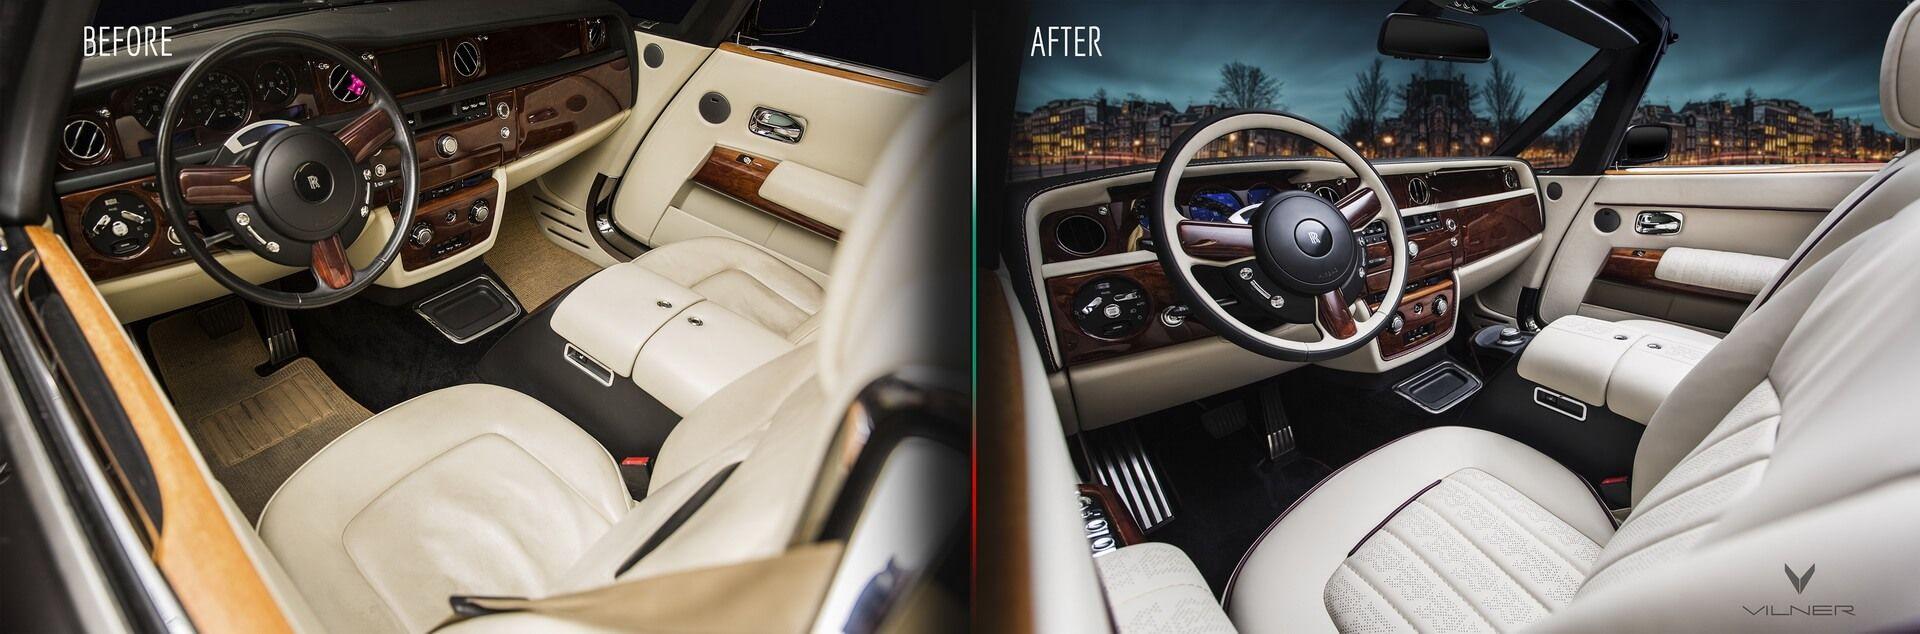 Rolls-Royce_Phantom_Drophead_Coupe_By_Vilner_0014